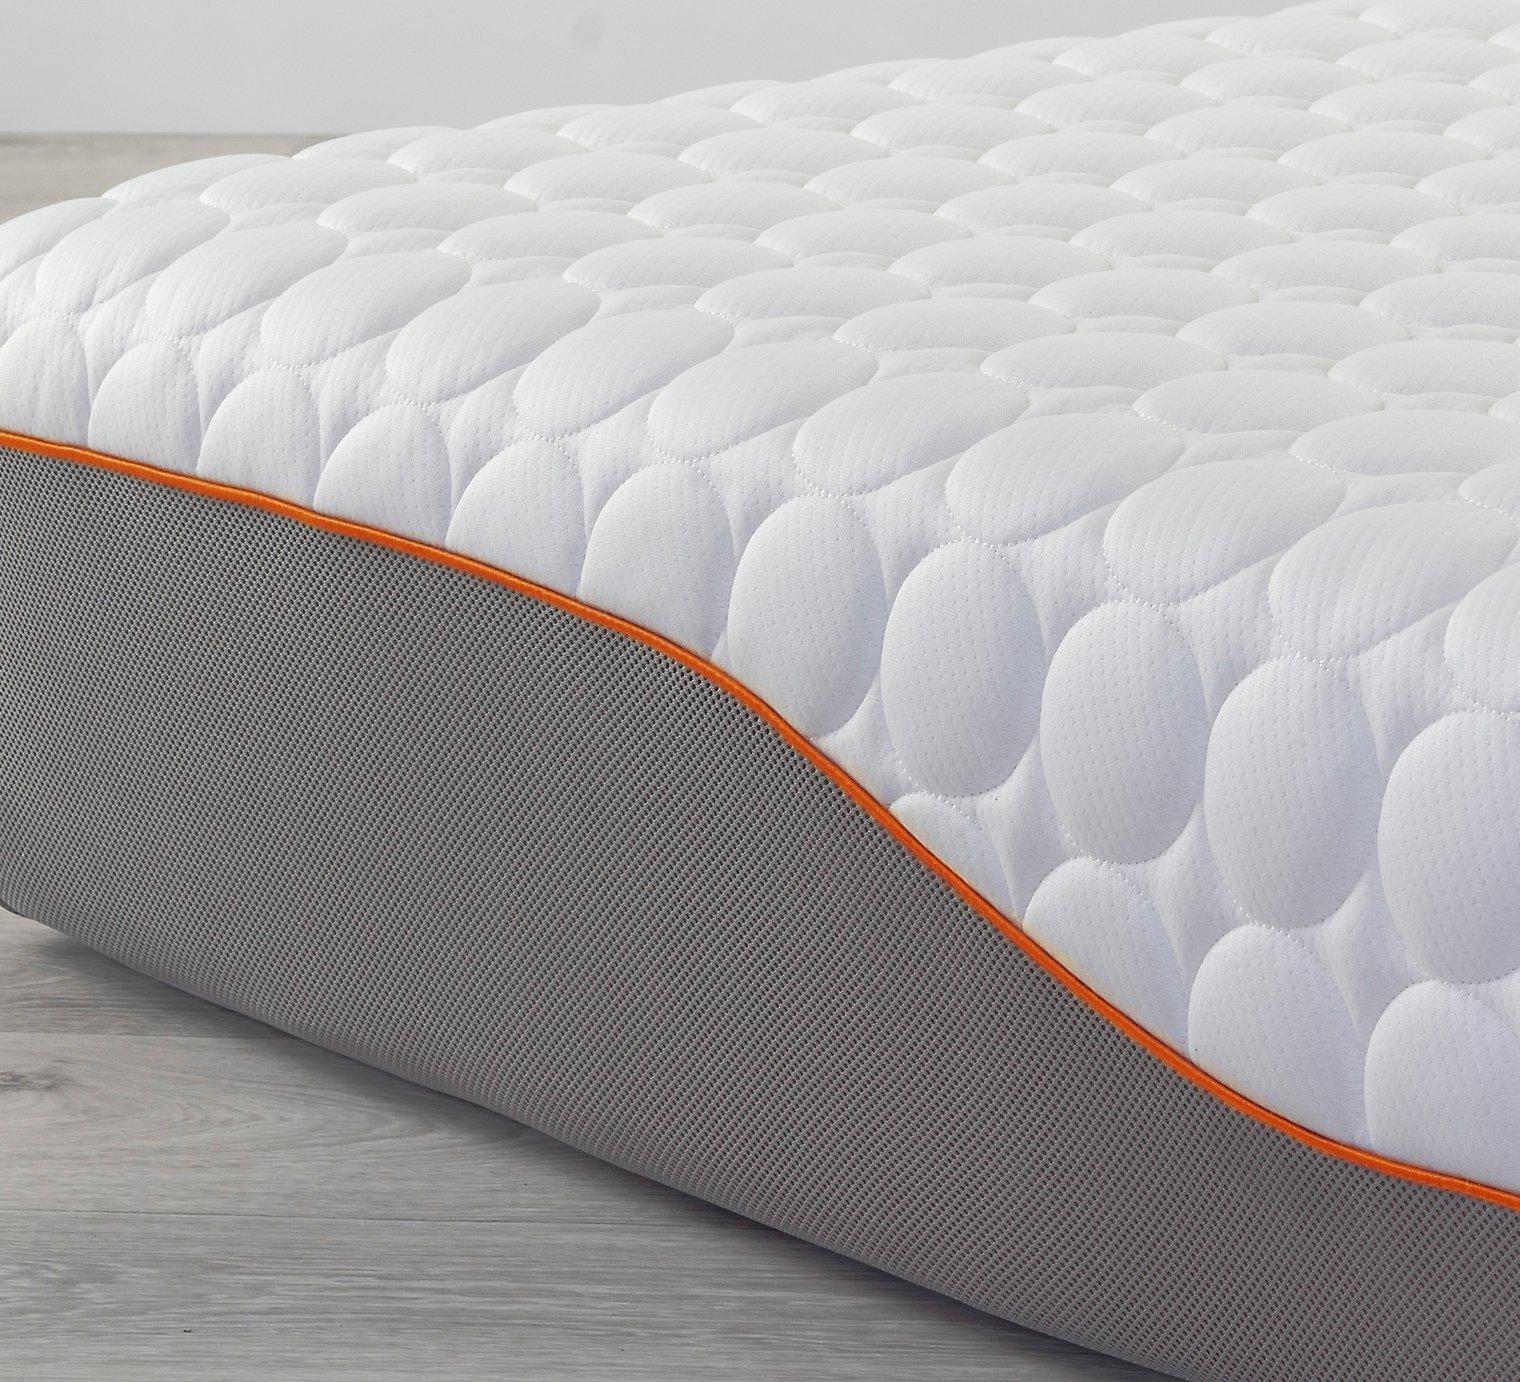 Mammoth rise plus double mattress